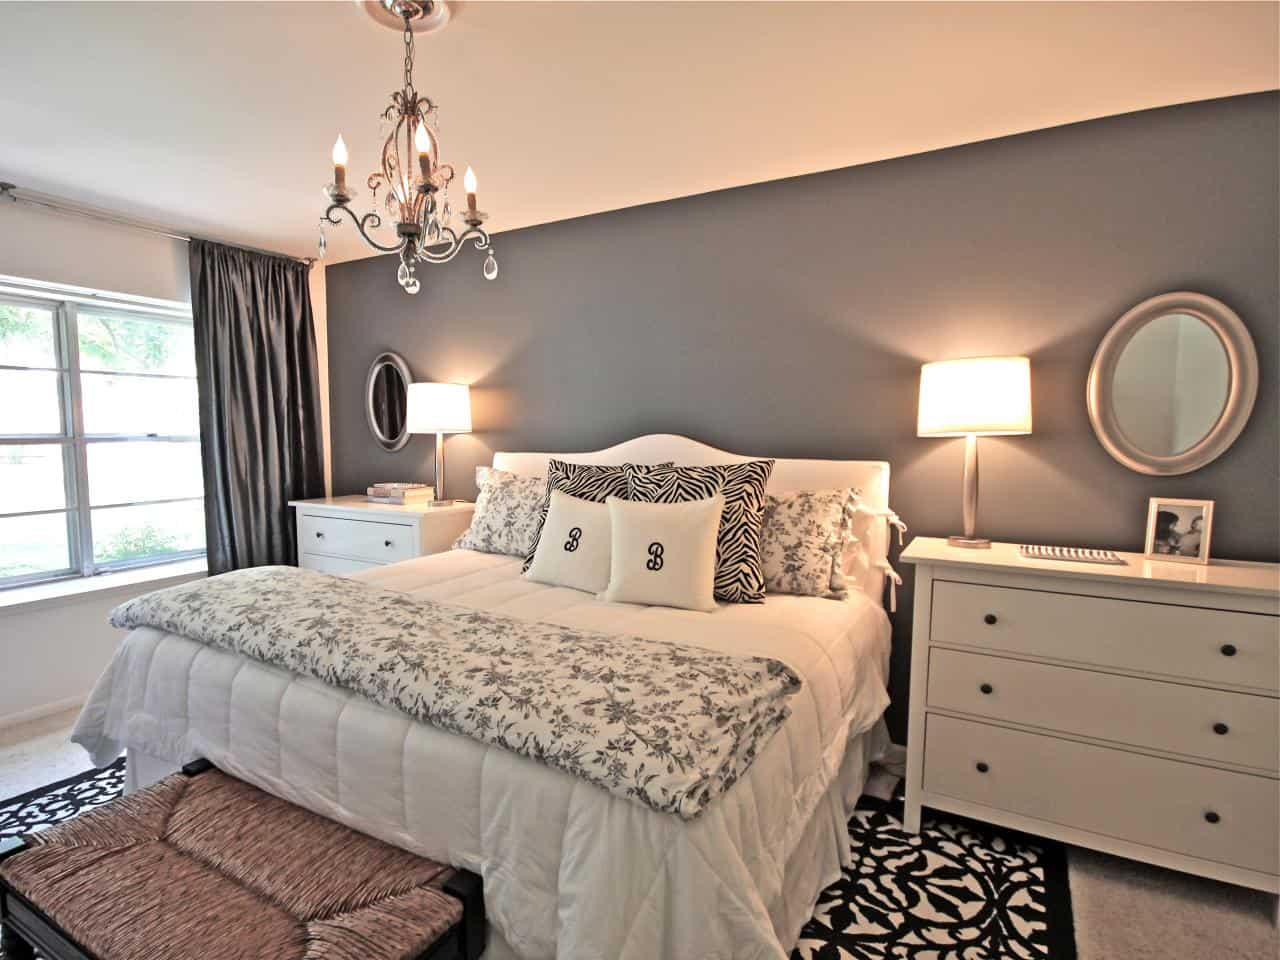 Elegant-31-Beautiful-Gray-Bedroom-Colors-Schemes-Ideas-Best-Home-Decor-For-Gray-Bedroom-gray-bedroom-walls-pinterest-gray-walls-bedroom-photos